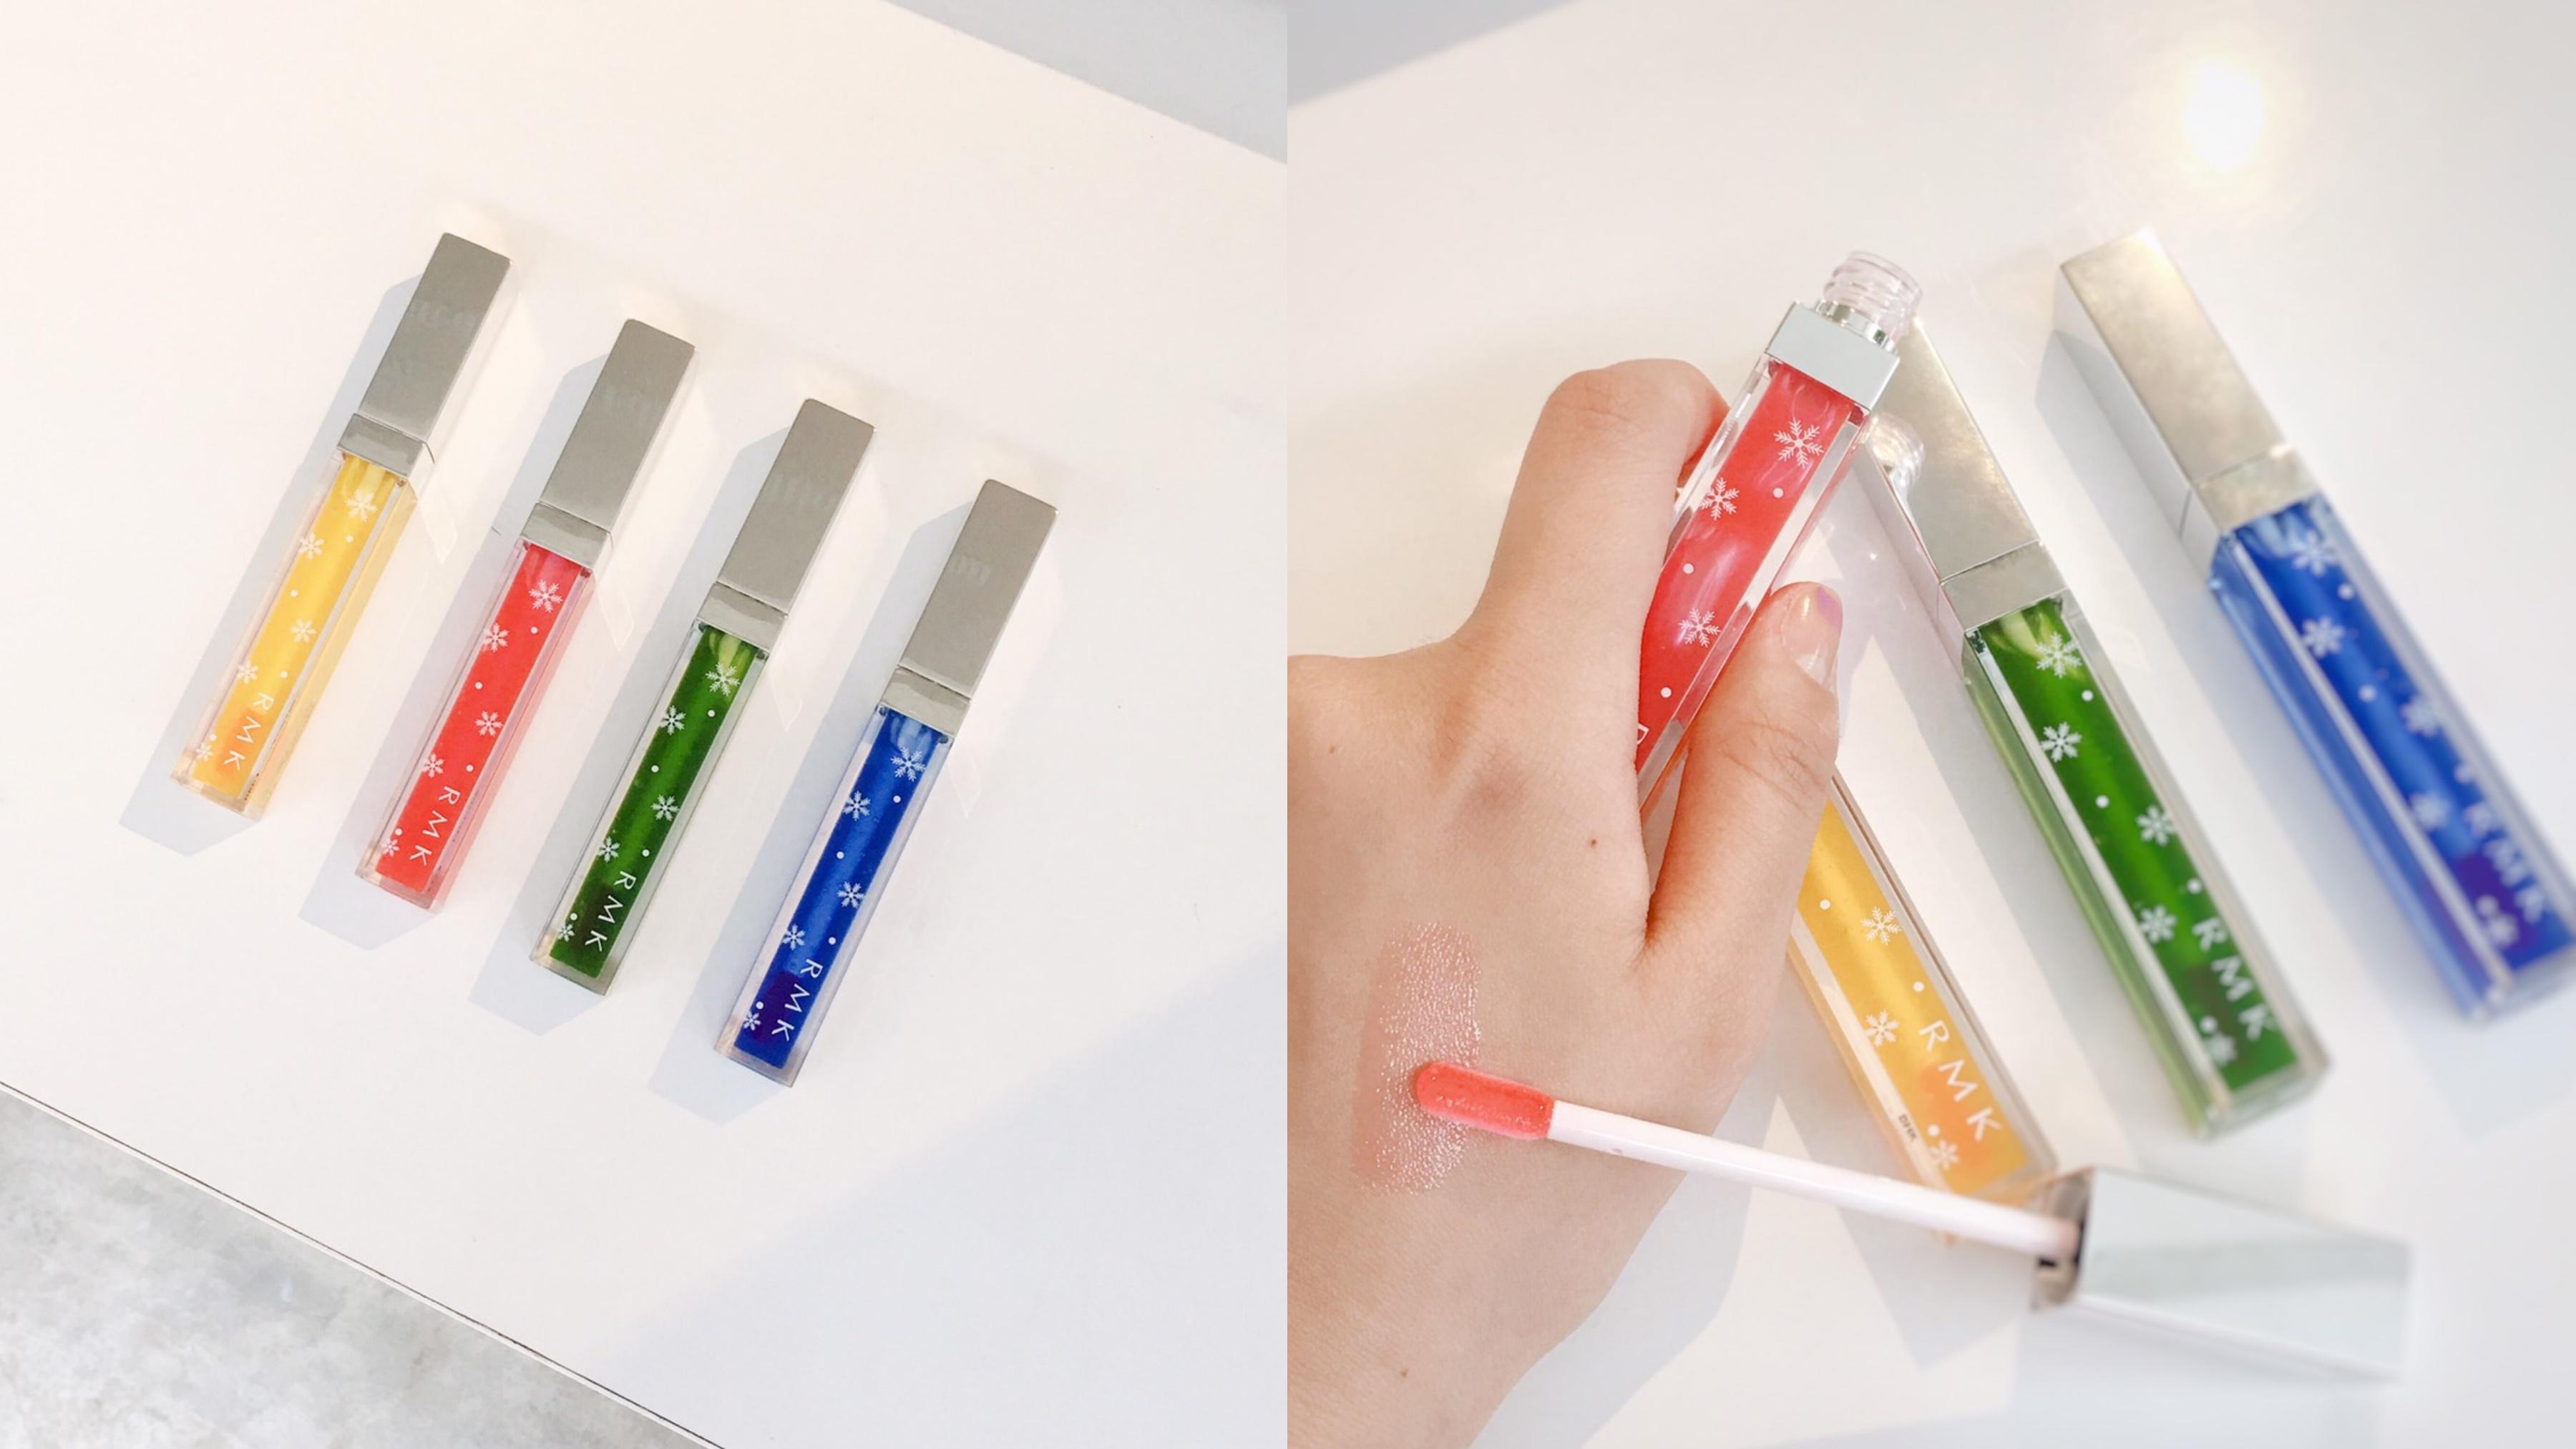 RMK 誘光潤唇釉 RMK Tinted Oil Fit Gloss 全4色 5.5g